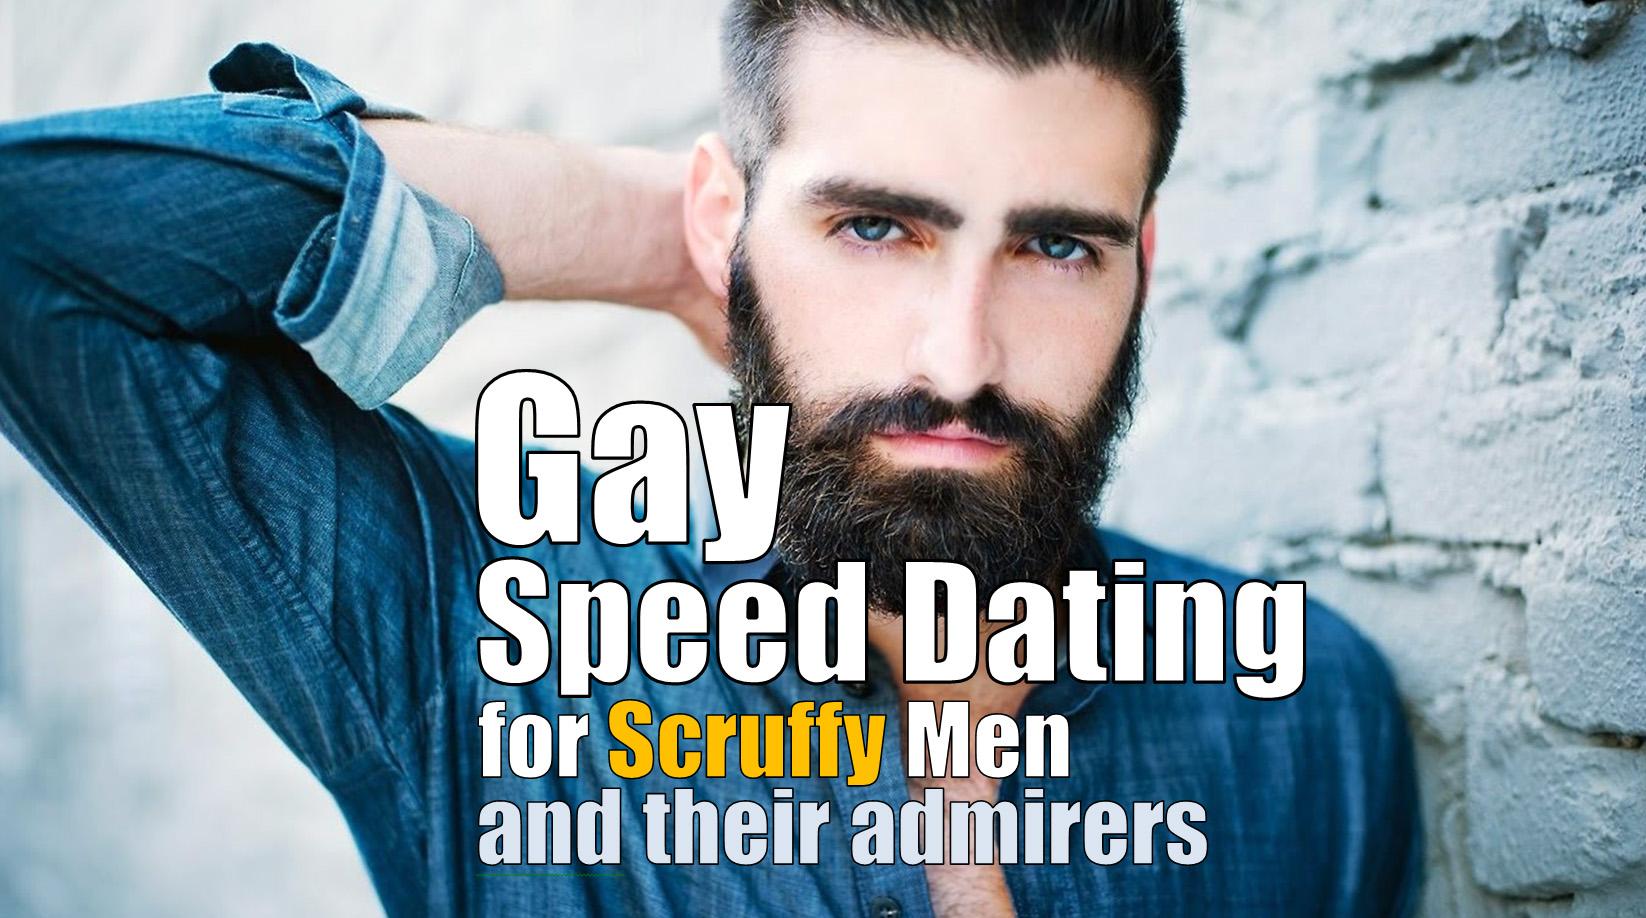 Gay bear speed dating